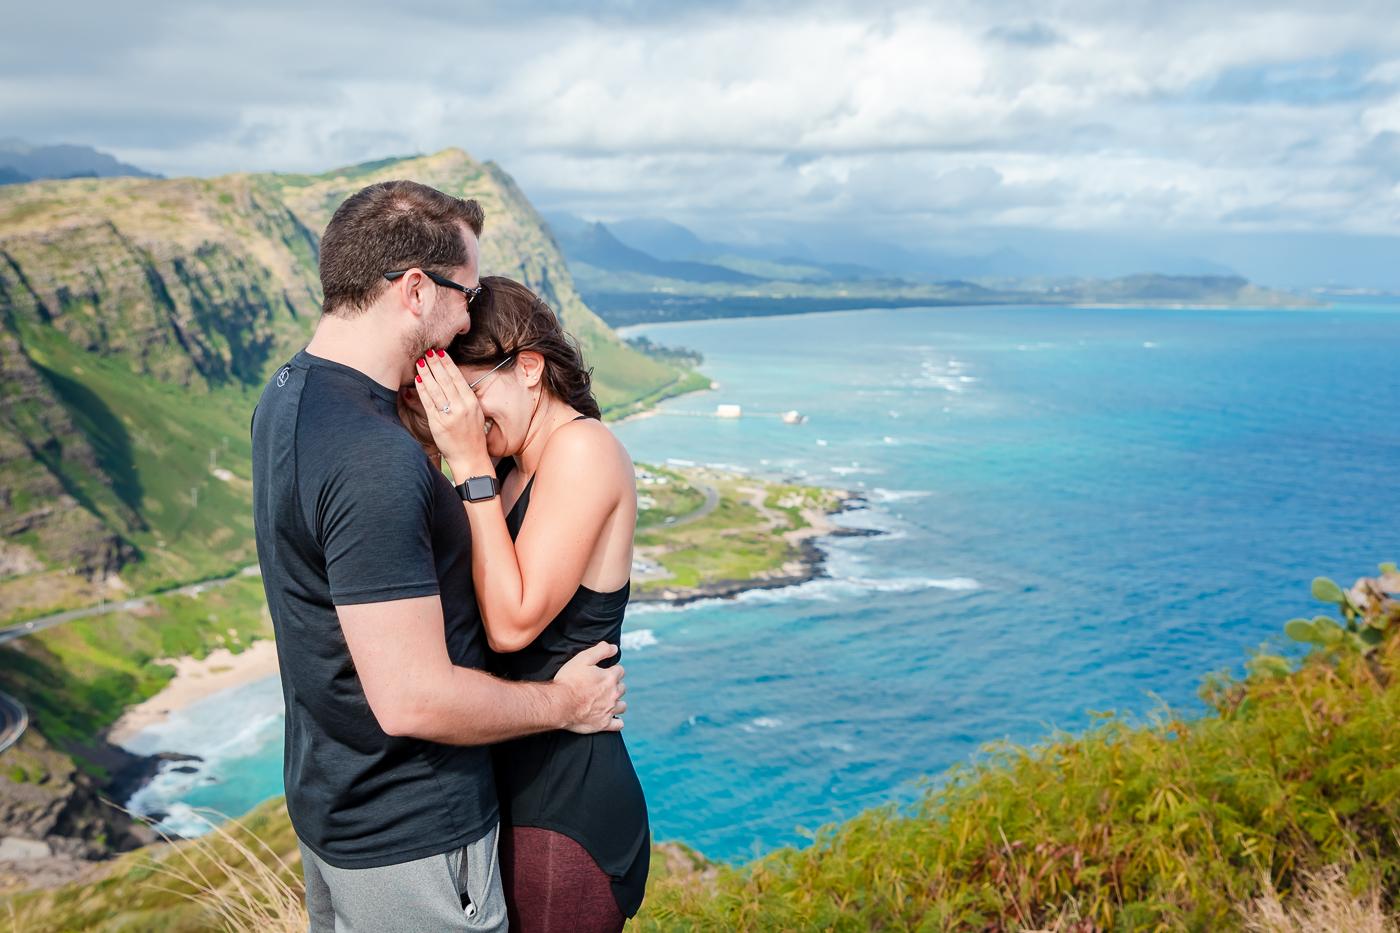 romantic couples surprise proposal photo session oahu hawaii